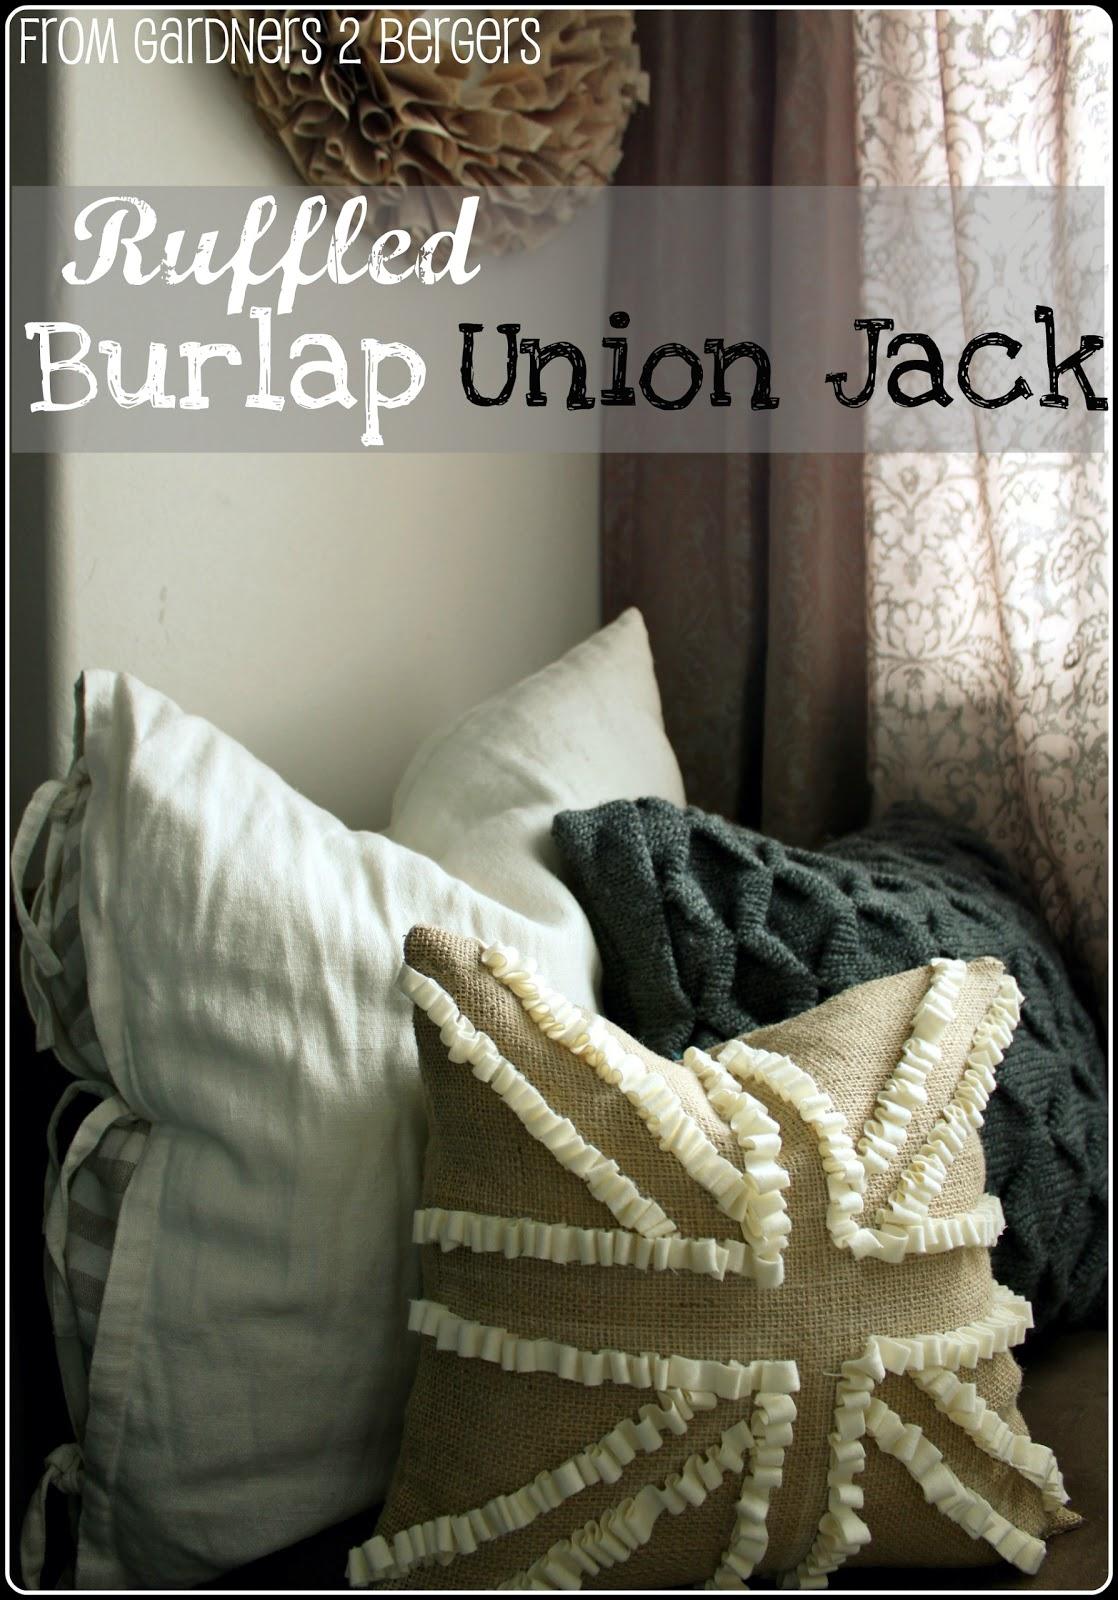 Burlap-and-Ruffle-Union-Jack-Pillow-fg2b